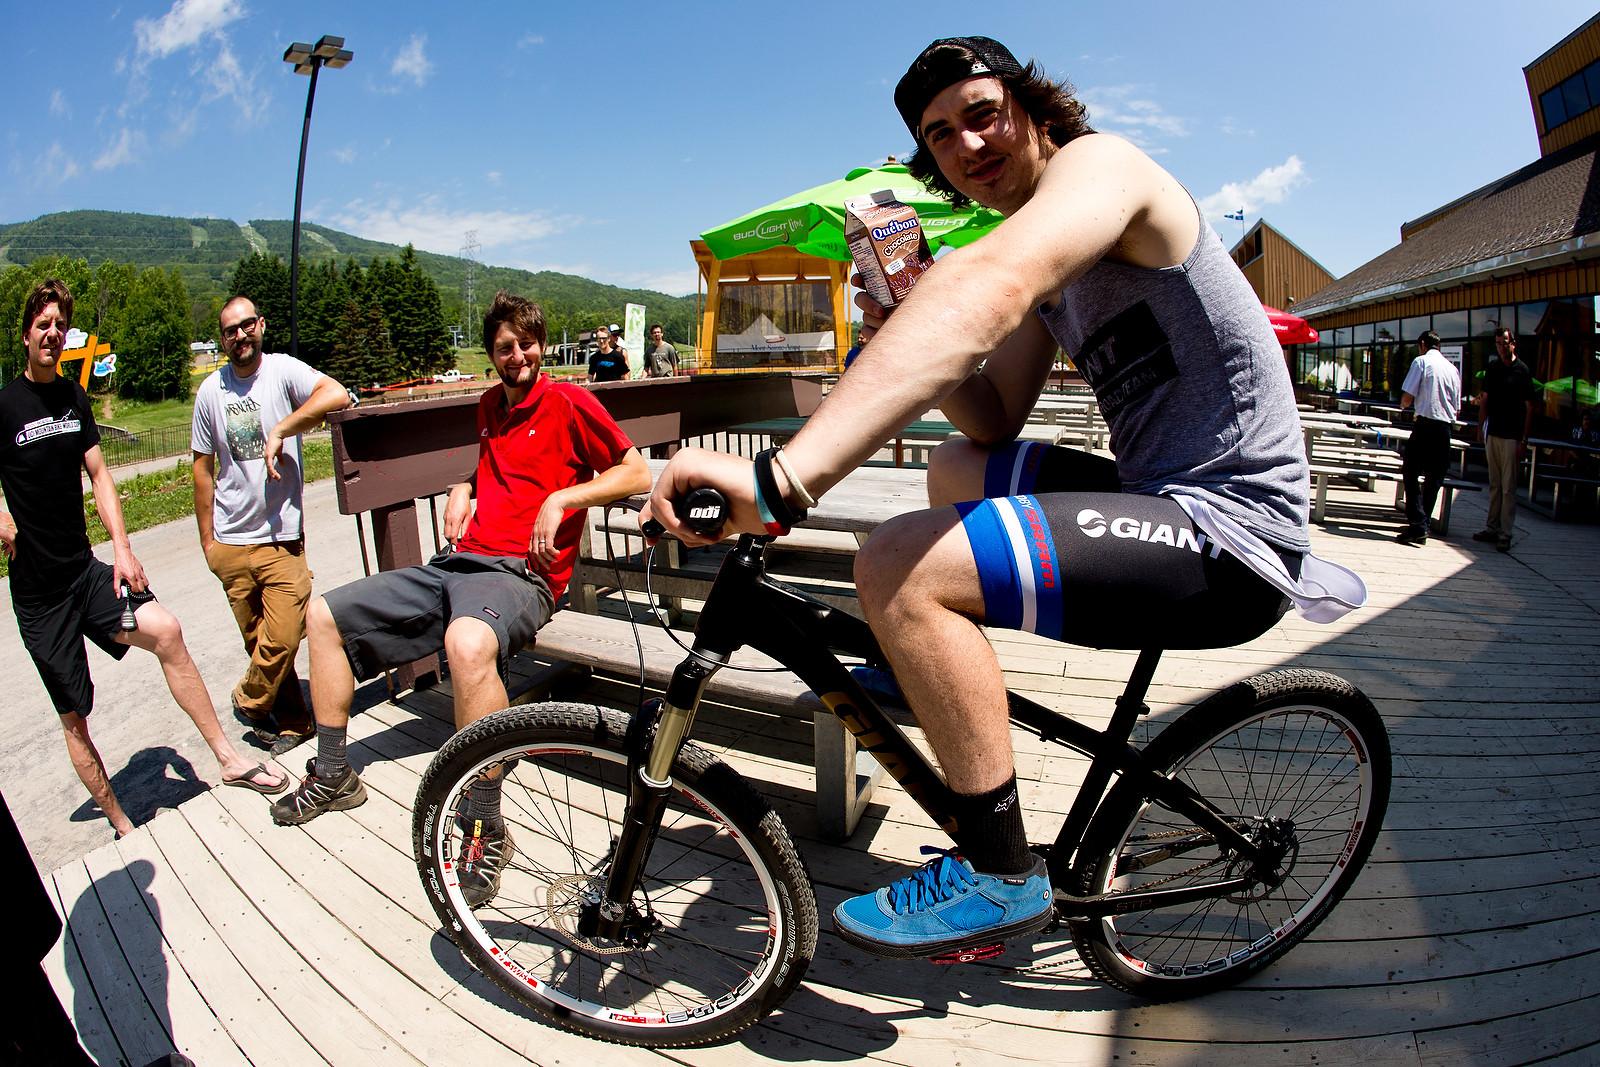 Danny Hart at Mont Sainte Anne 2012 - 2012 UCI World Cup, Mont Sainte Anne, Day 1 - Mountain Biking Pictures - Vital MTB